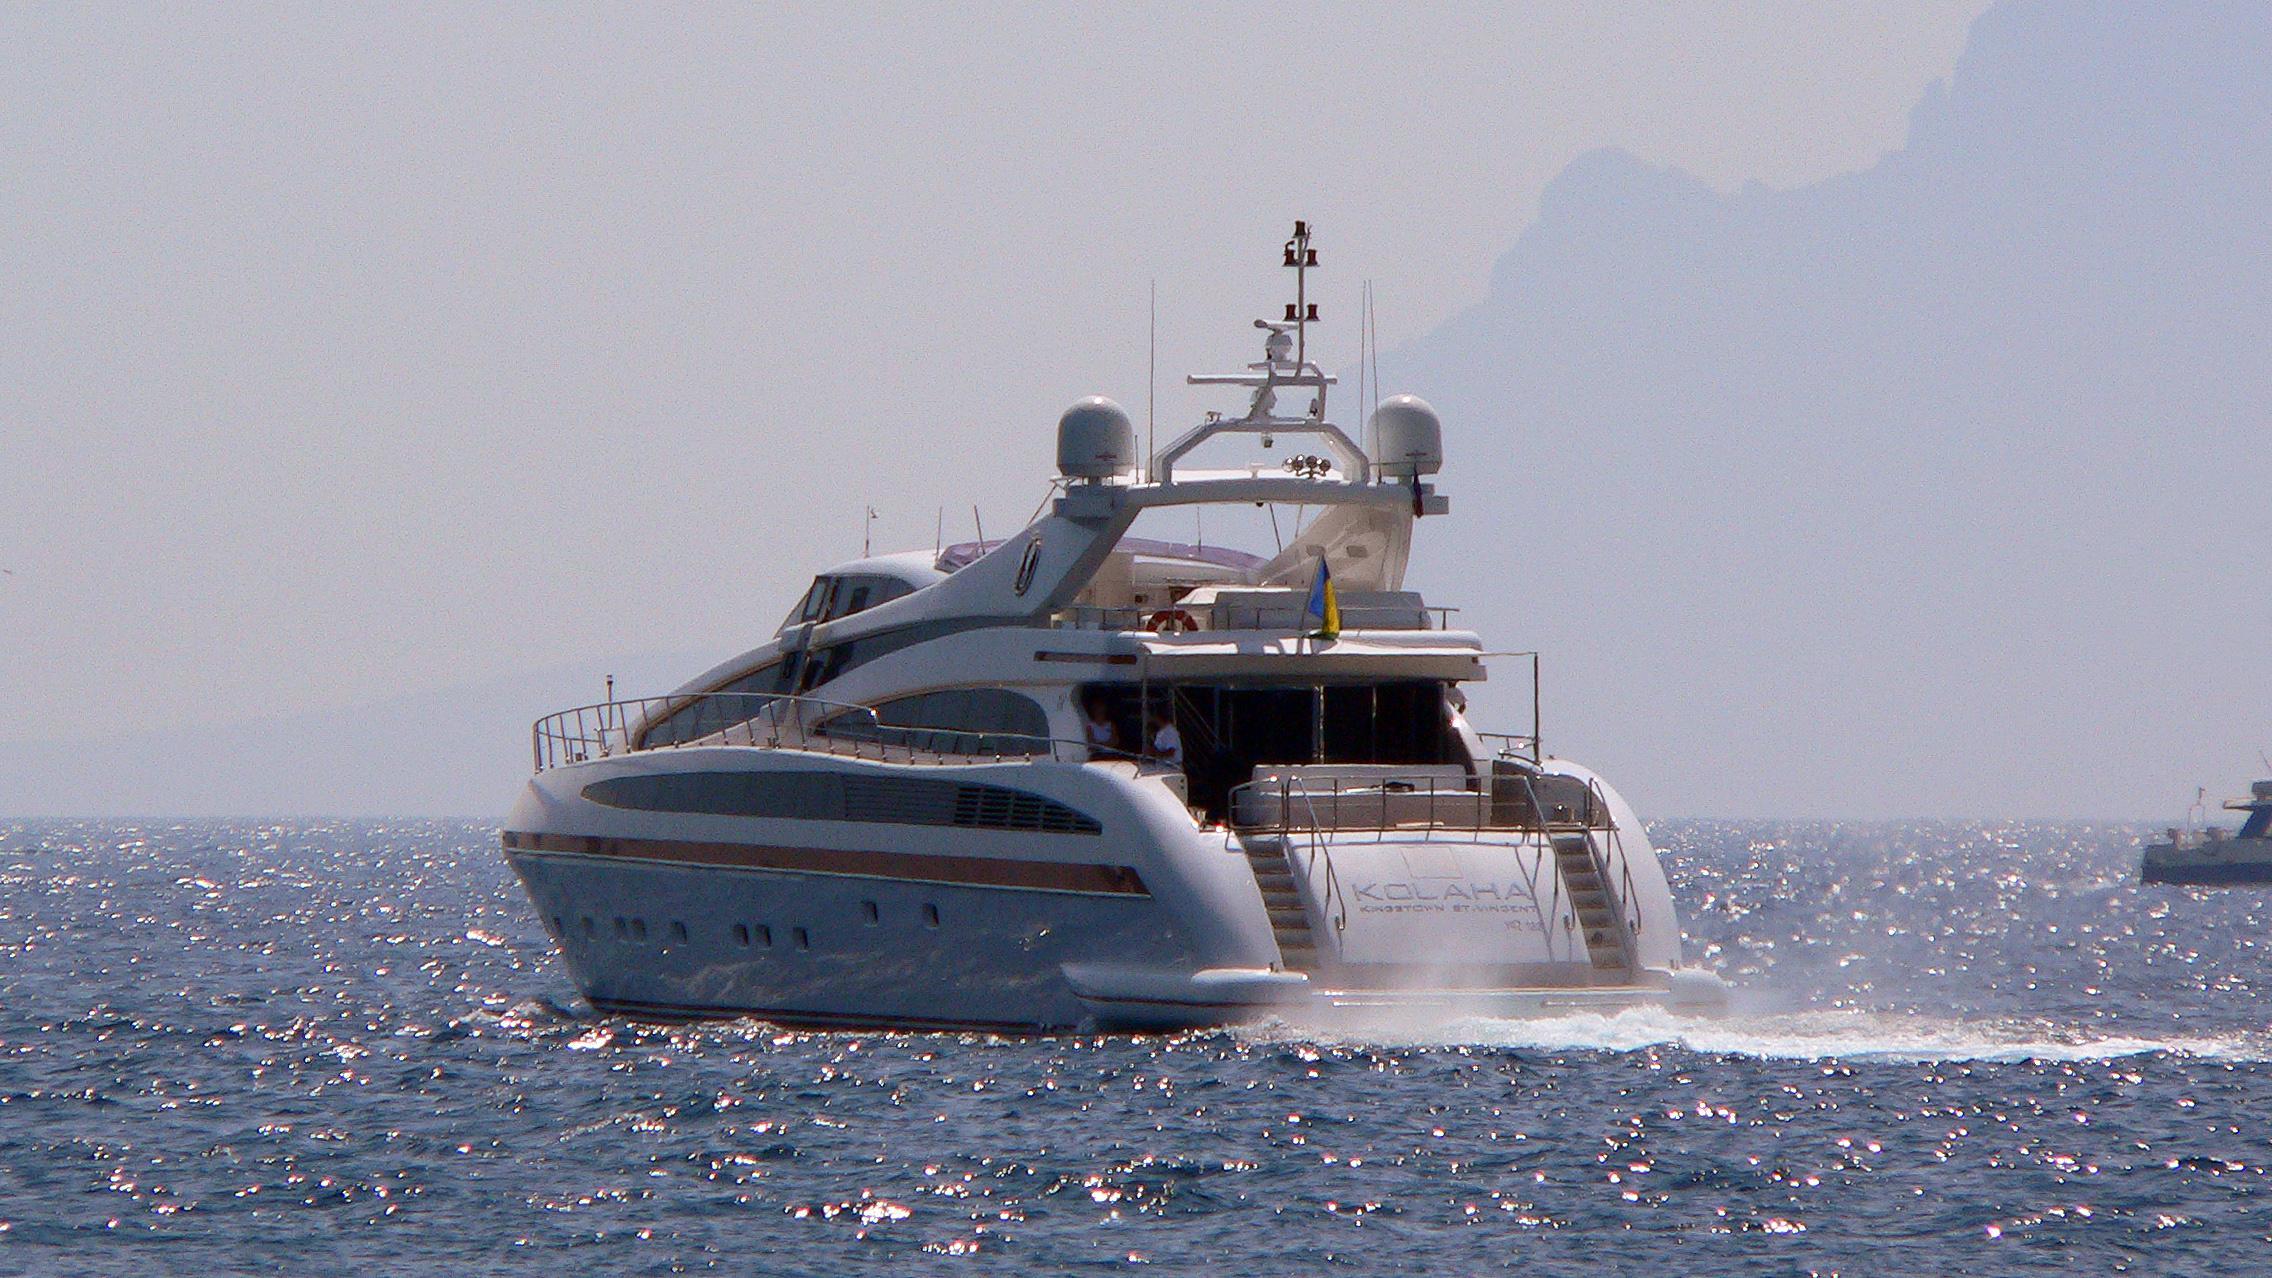 samja-motor-yacht-isa-133-2004-41m-cruising-stern